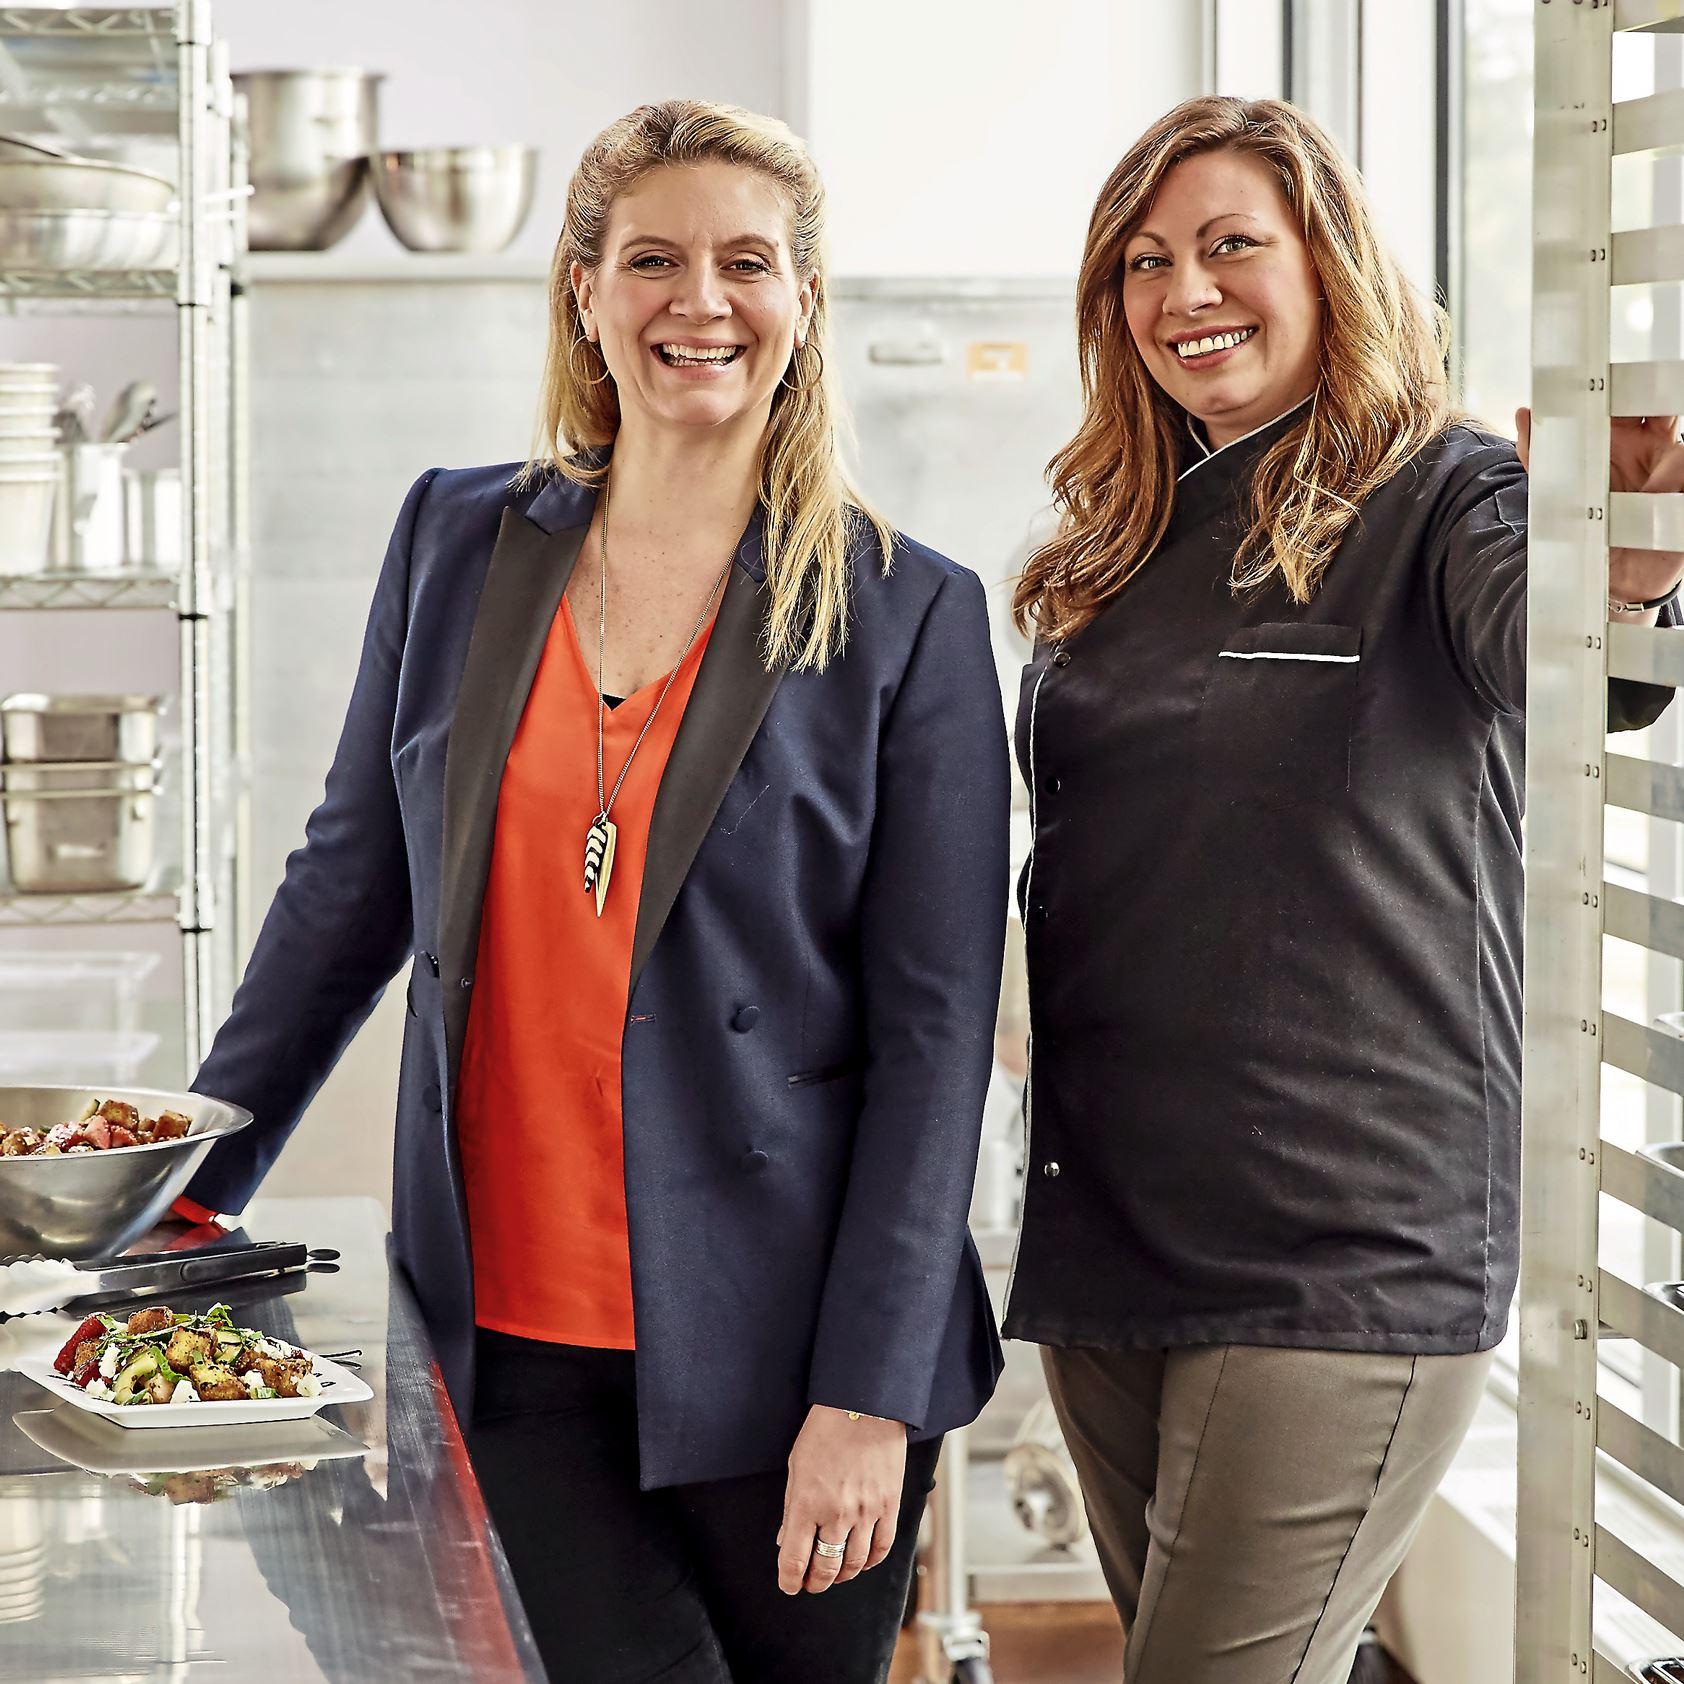 Johnstown Restaurateur Wins $50,000, Visit From Amanda